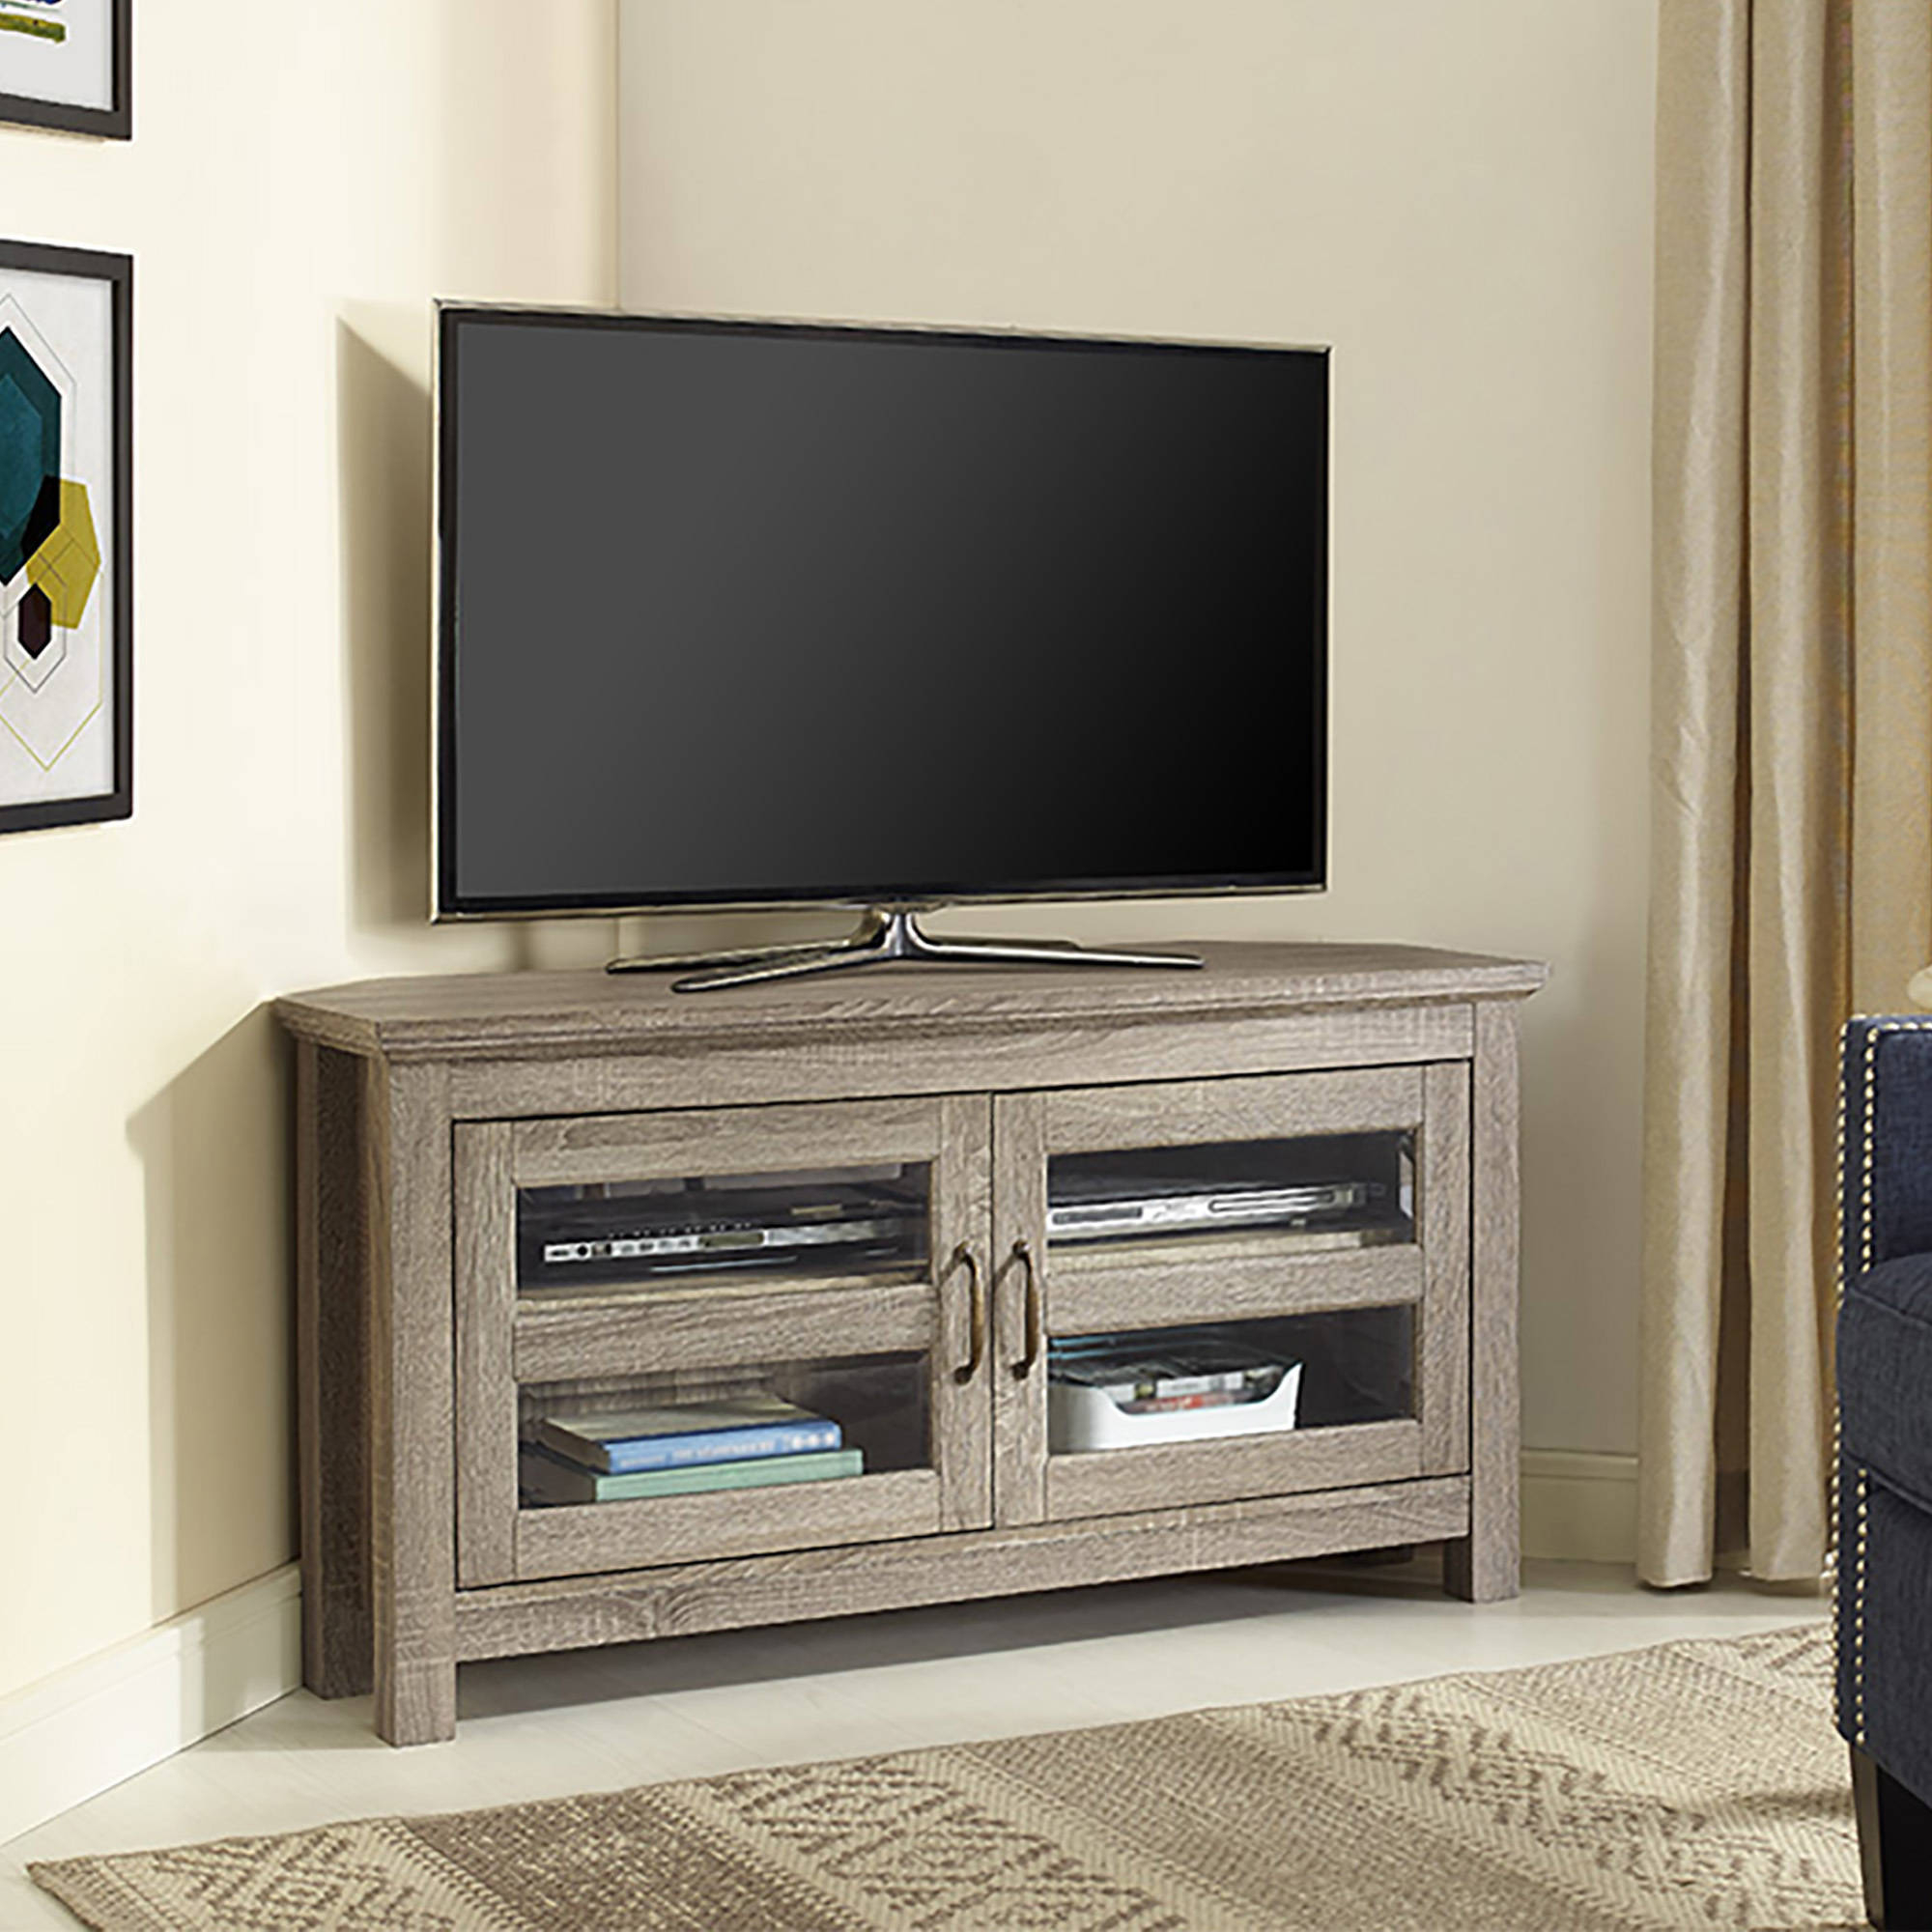 "Walker Edison Black Corner Tv Stand For Tvs Up To 48 With Regard To Corner Tv Stands For Tvs Up To 48"" Mahogany (View 18 of 20)"